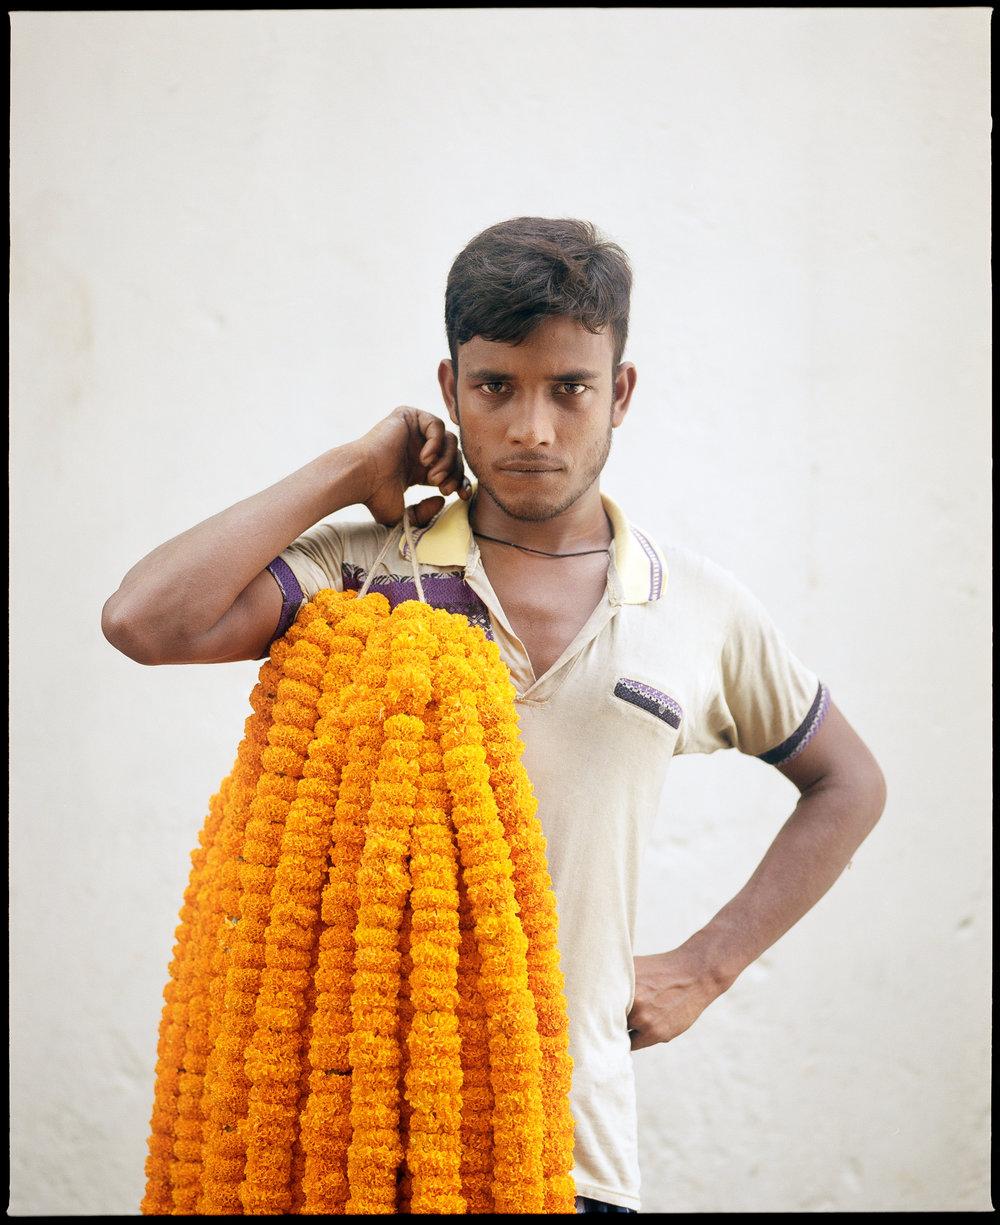 Kolkata_Flowers-1.jpg